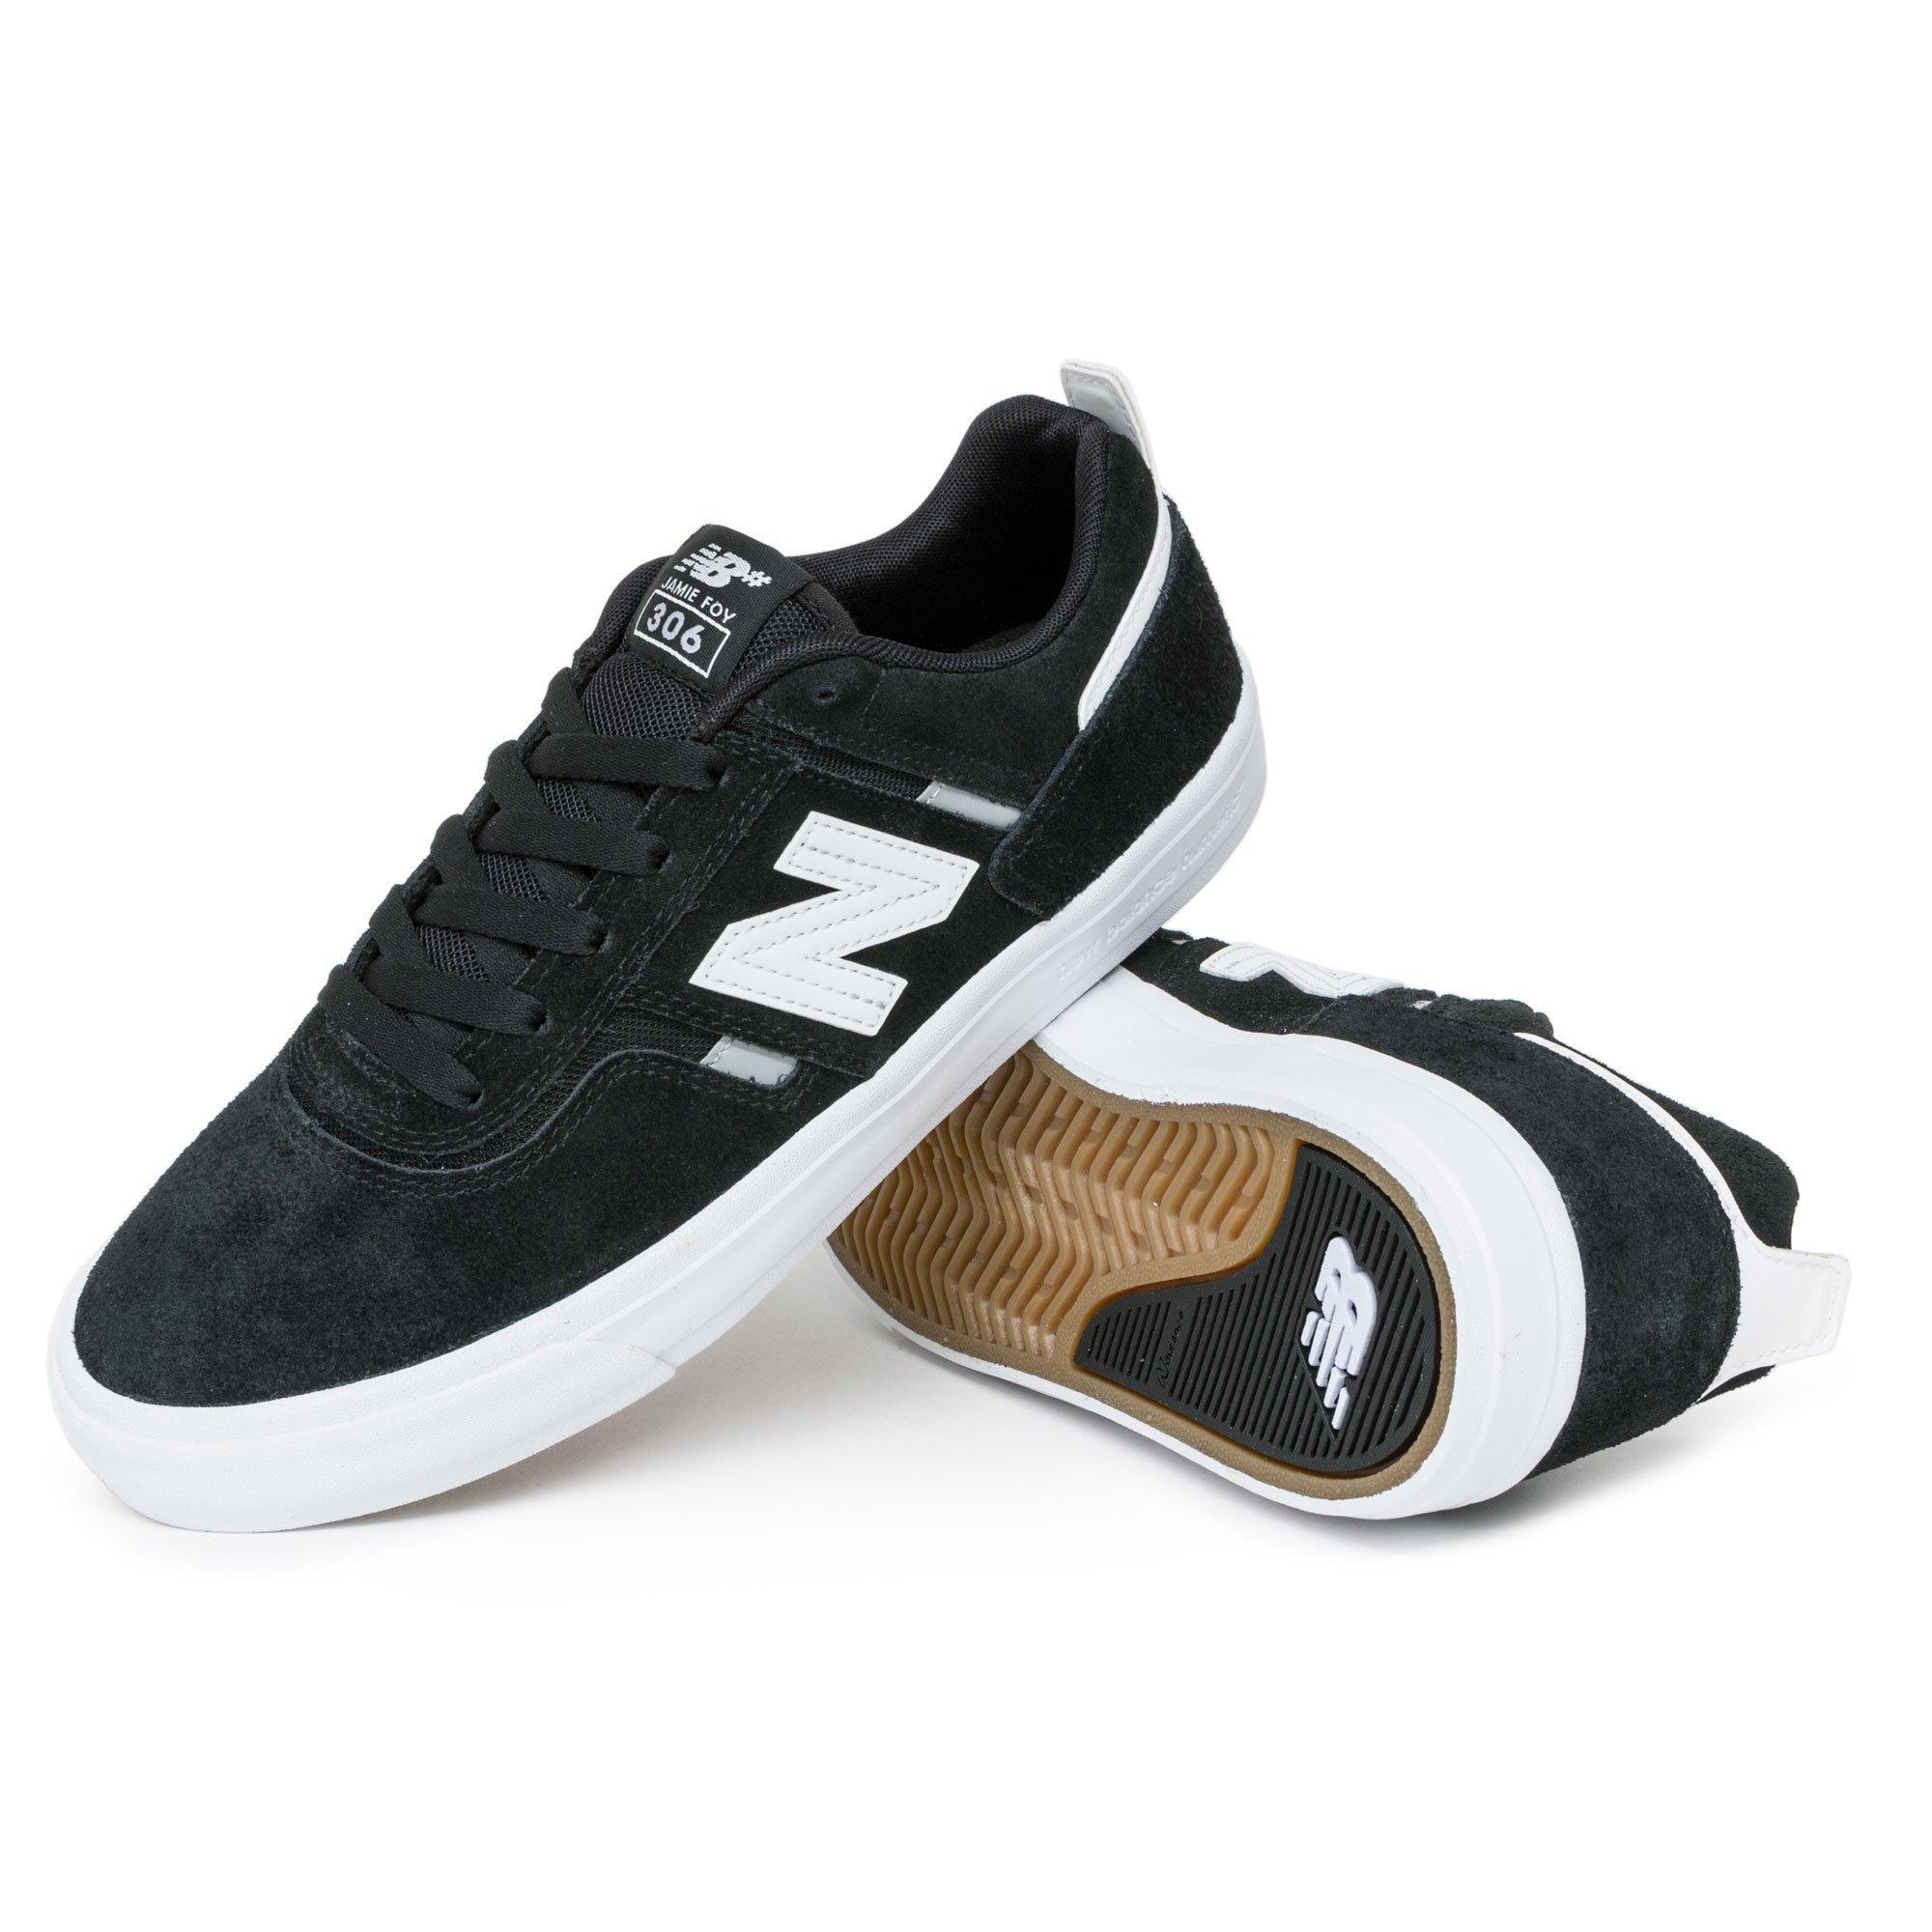 new balance 530 pro black/off white